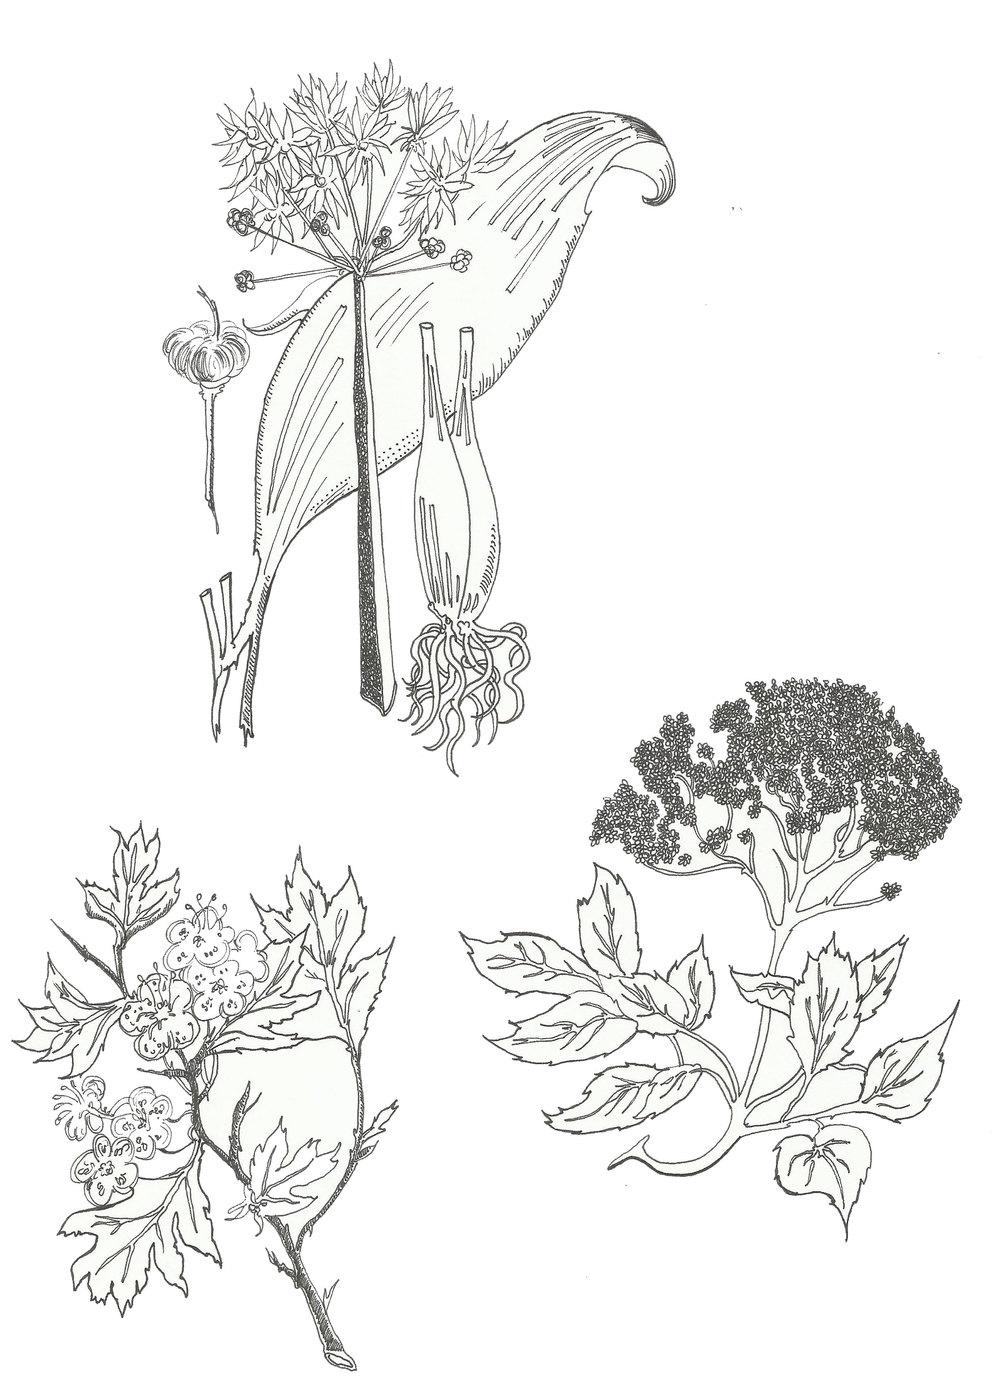 Flower Series - 2